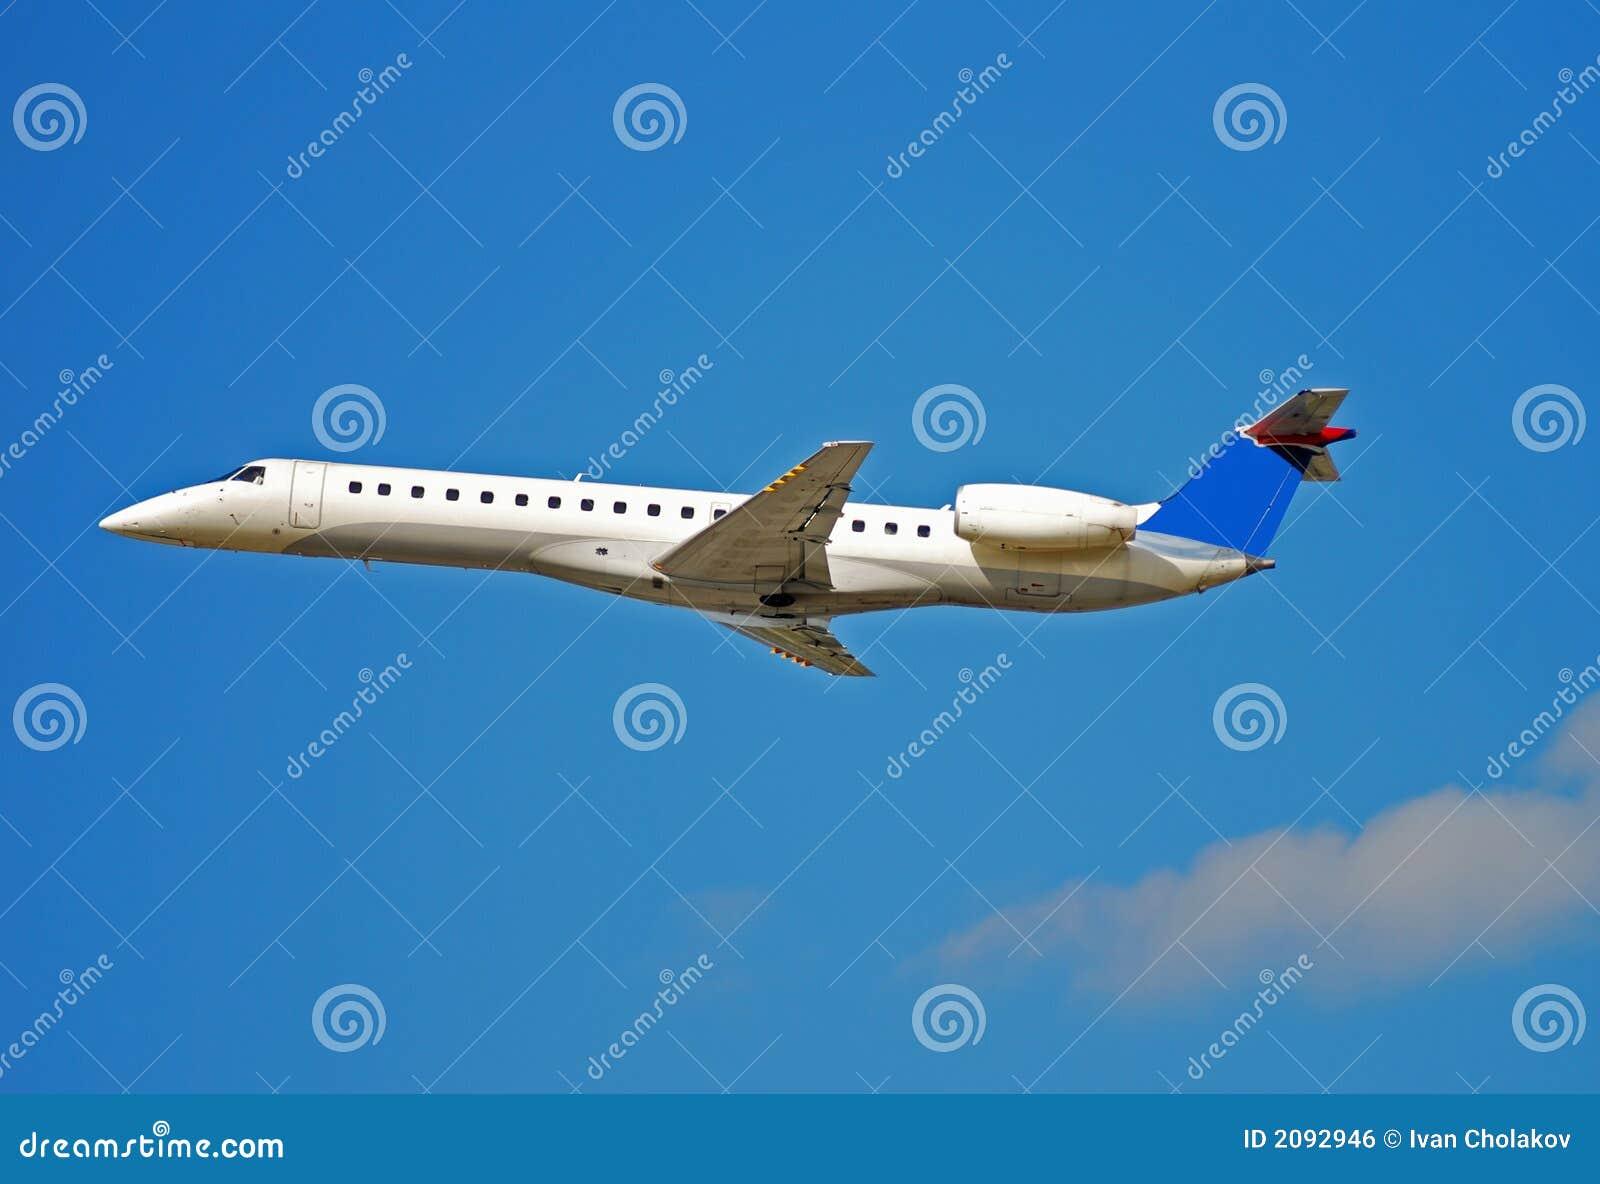 Embraer regional jet stock photo  Image of regional, flight